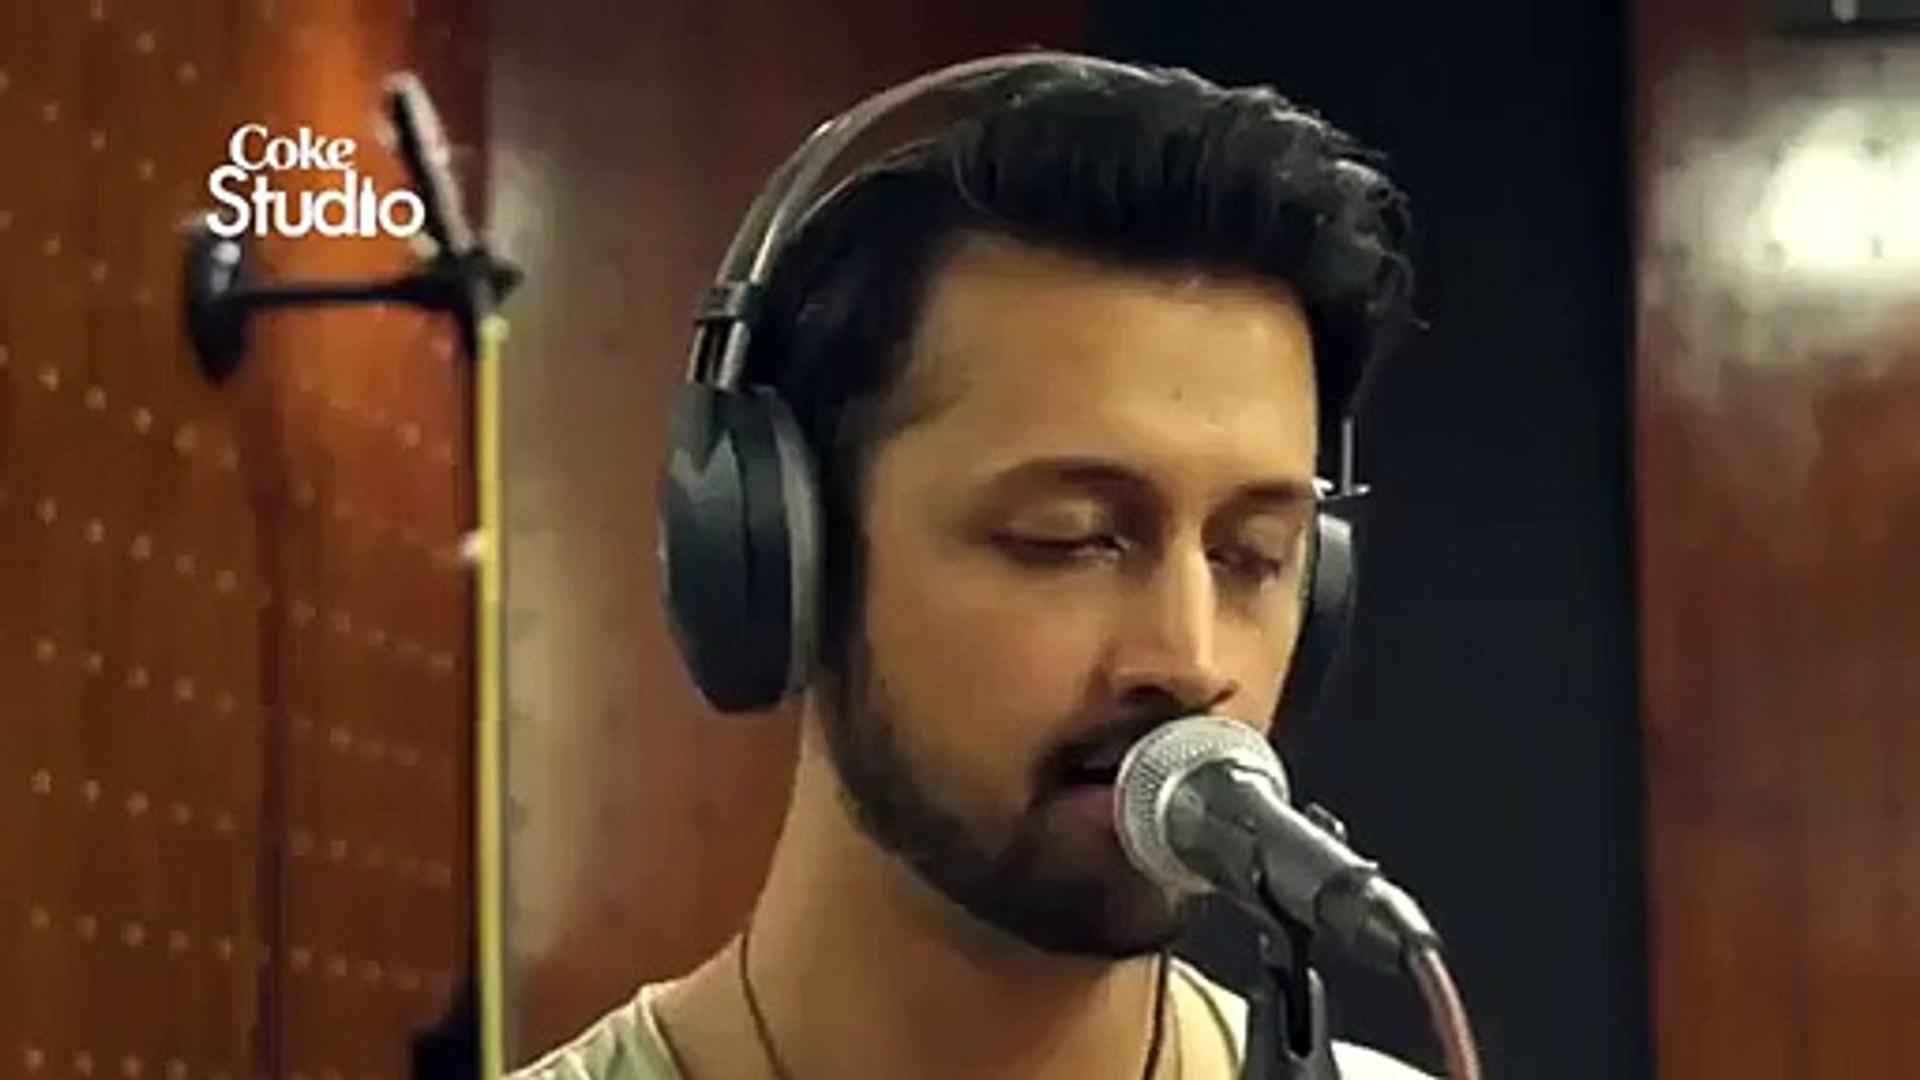 Reaction Of Gul Panra Singing With Atif Aslam in Coke Studio top songs best songs new songs upcoming